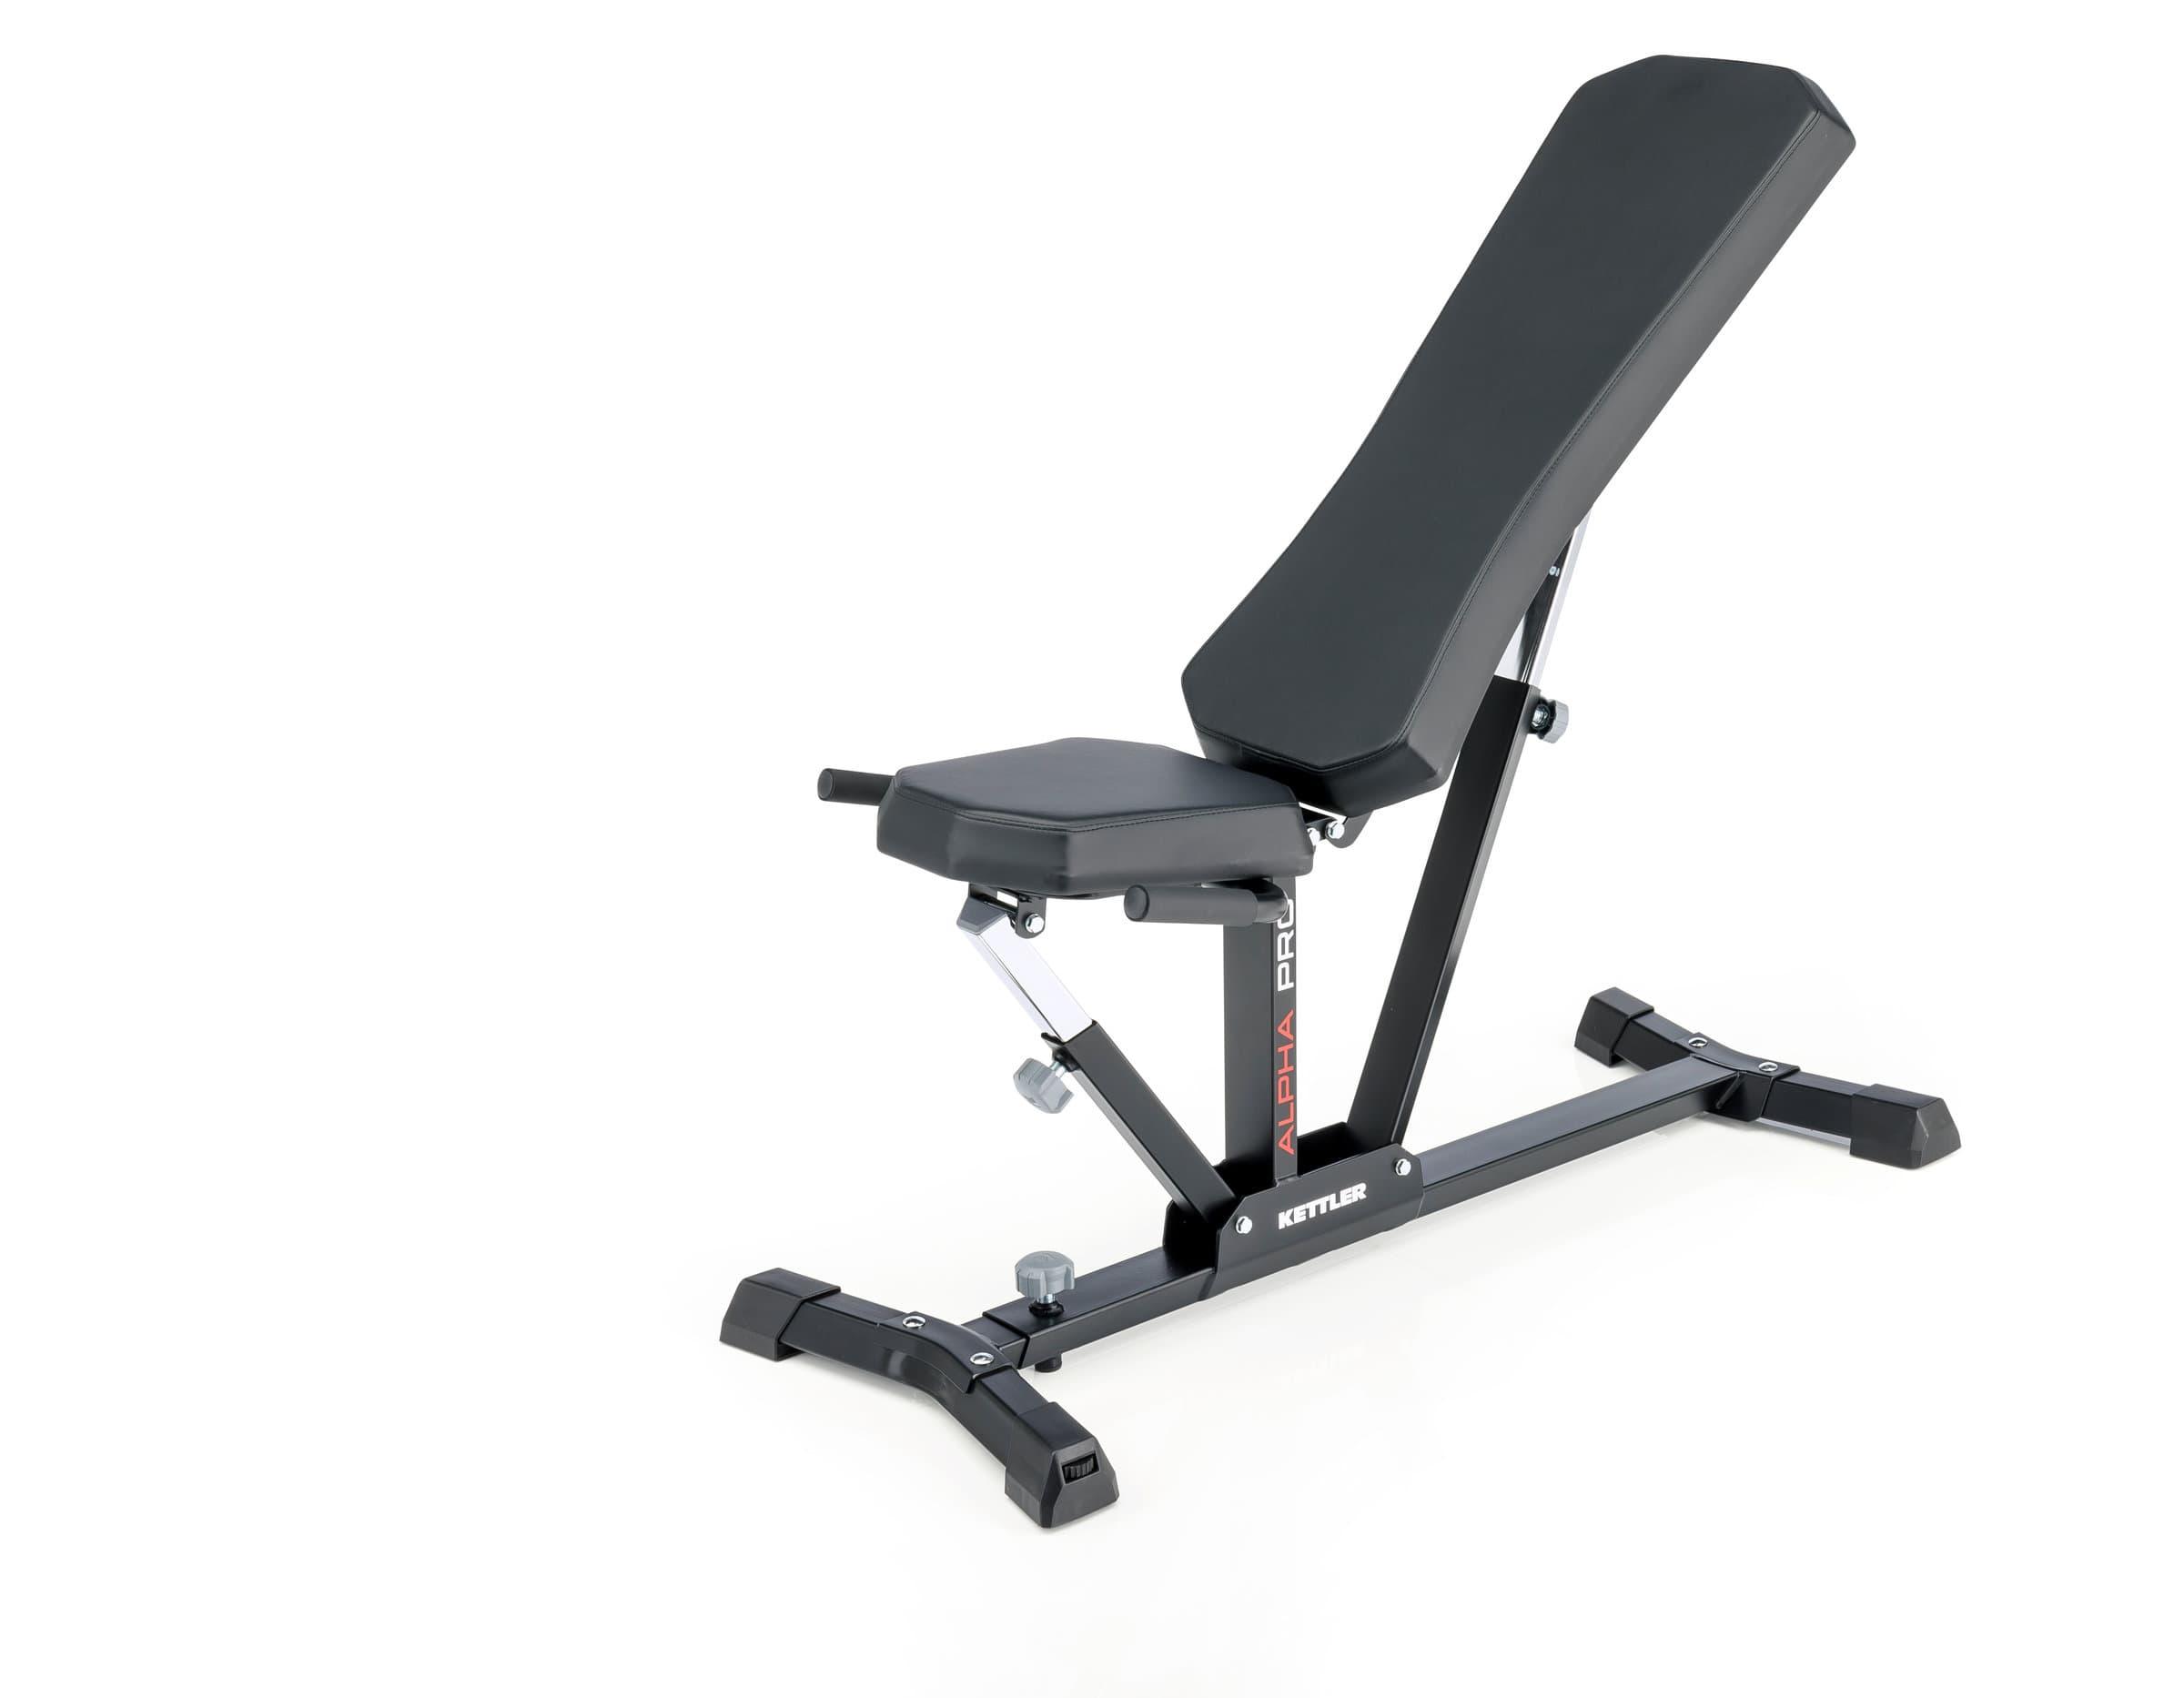 Kettler Alpha Pro Banc De Musculation Multifonction Migros